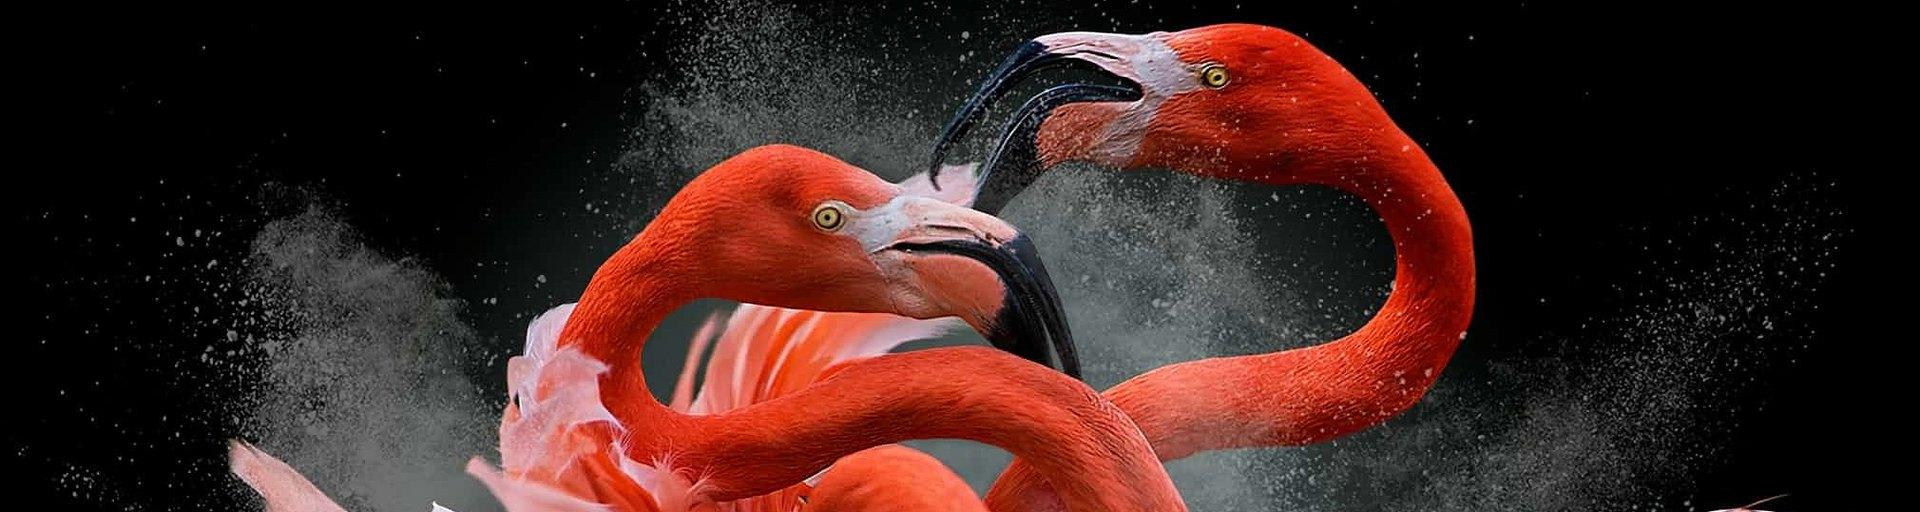 Лучшие фотографии птиц сконкурса Bird Photographer of the Year